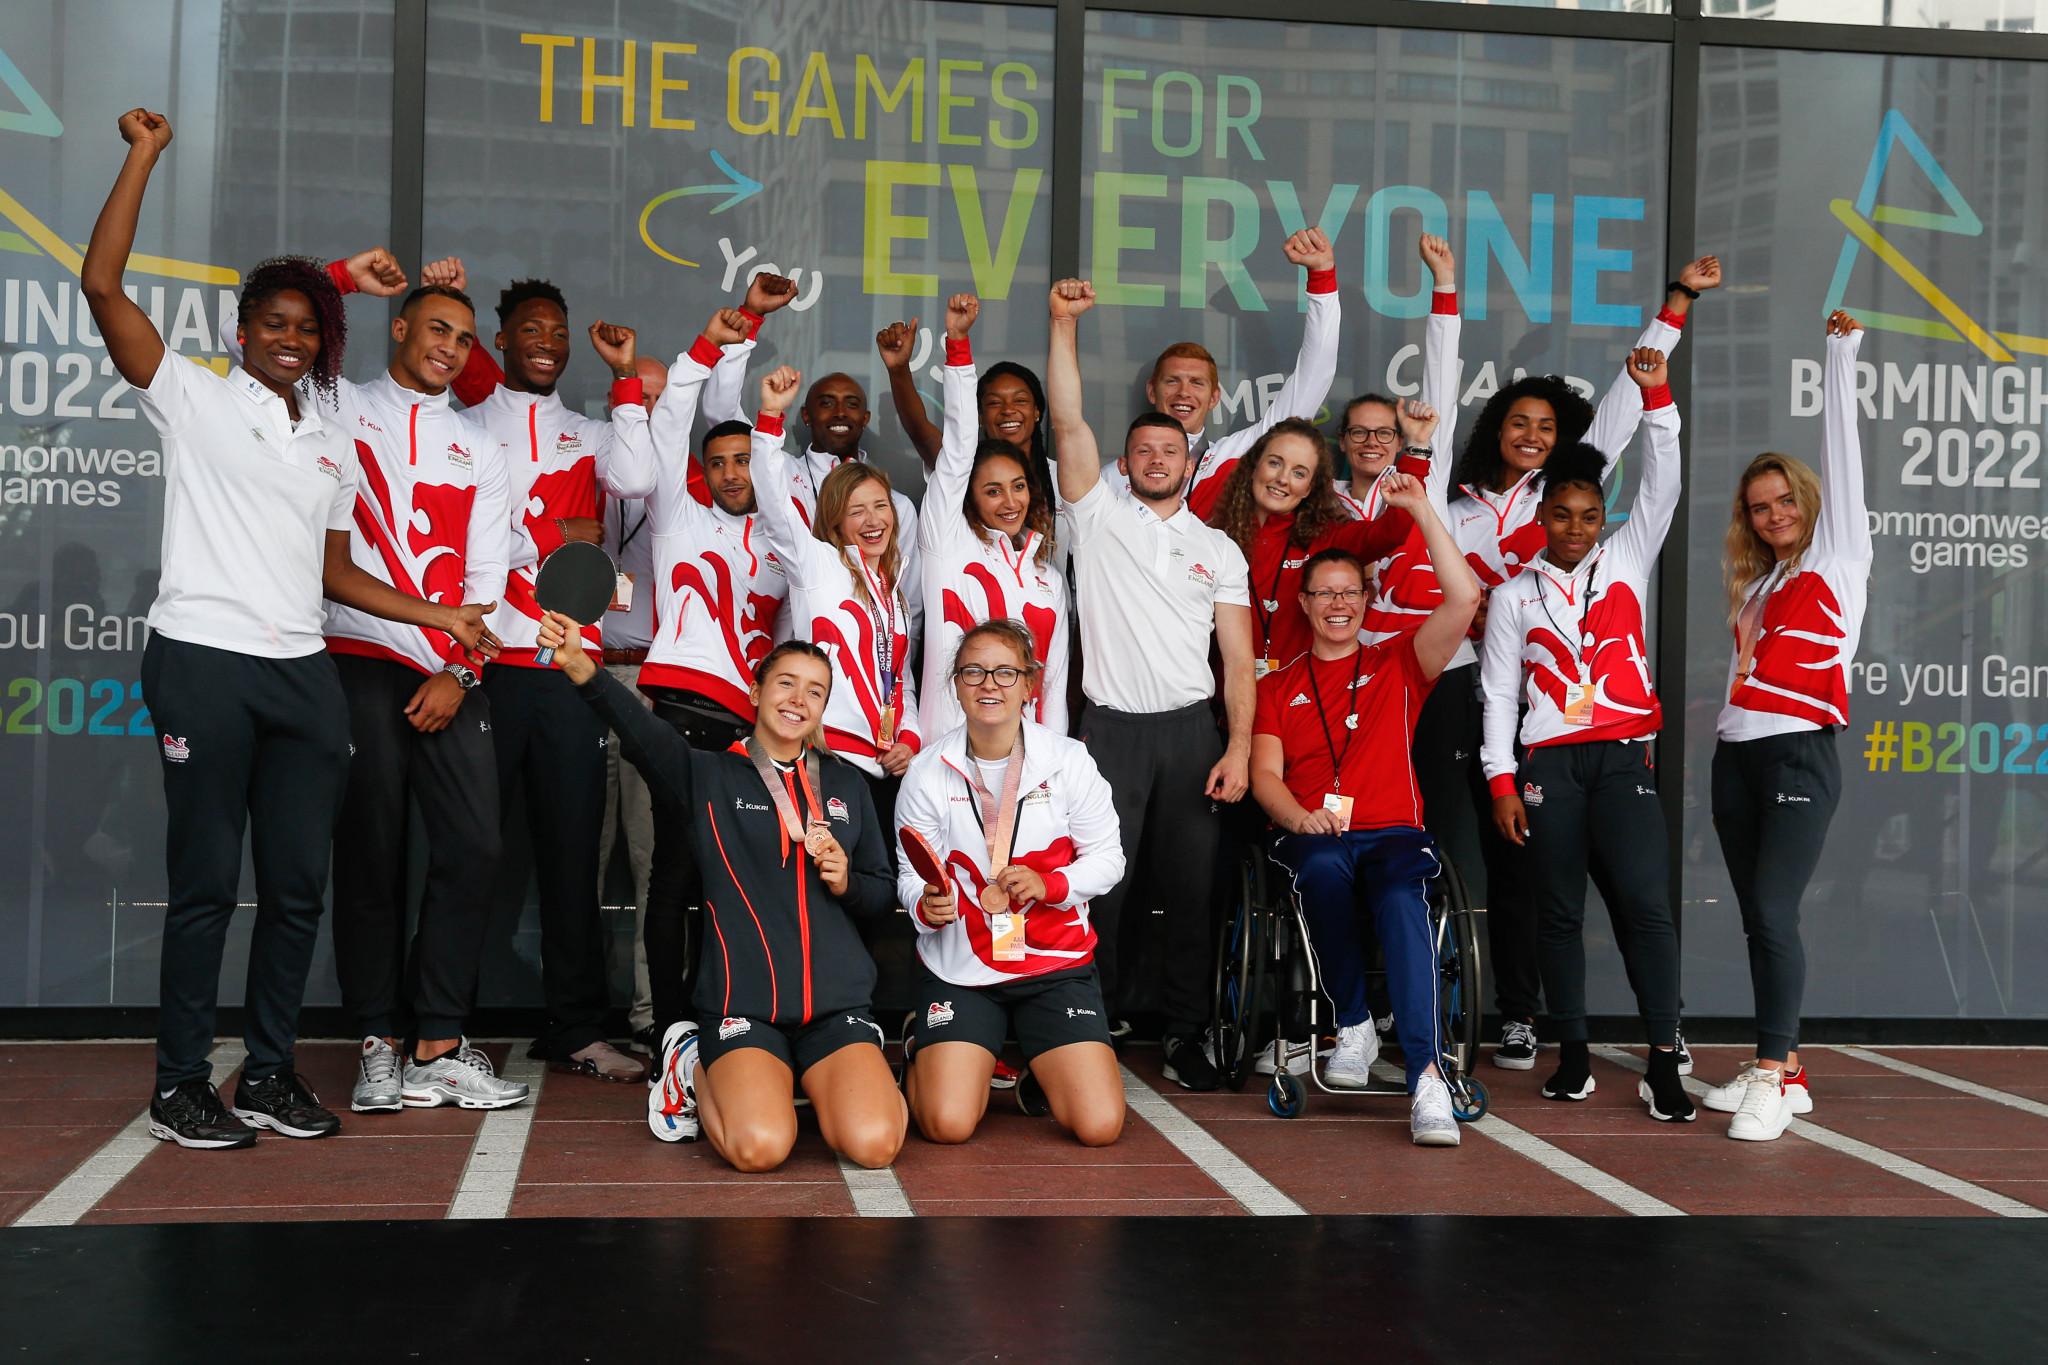 Birmingham eyes bid for World Athletics Road Running Championships as part of Commonwealth Games legacy